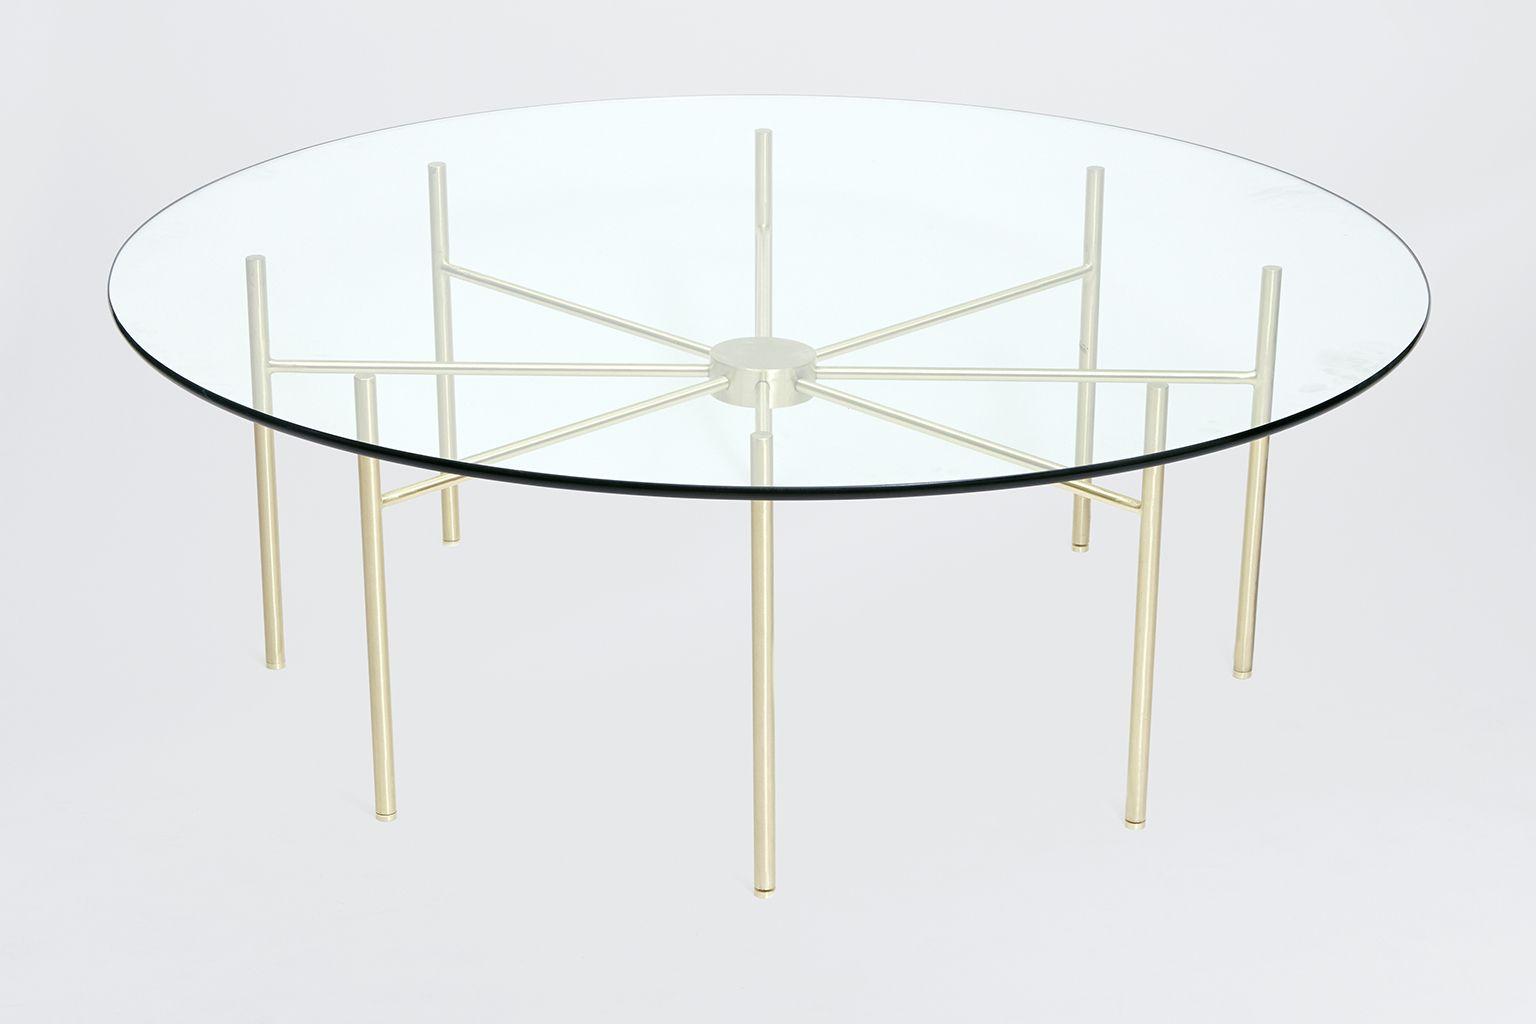 Radial Coffee Table Coffee Table Coffee Table Inspiration Table Furniture [ 1024 x 1536 Pixel ]